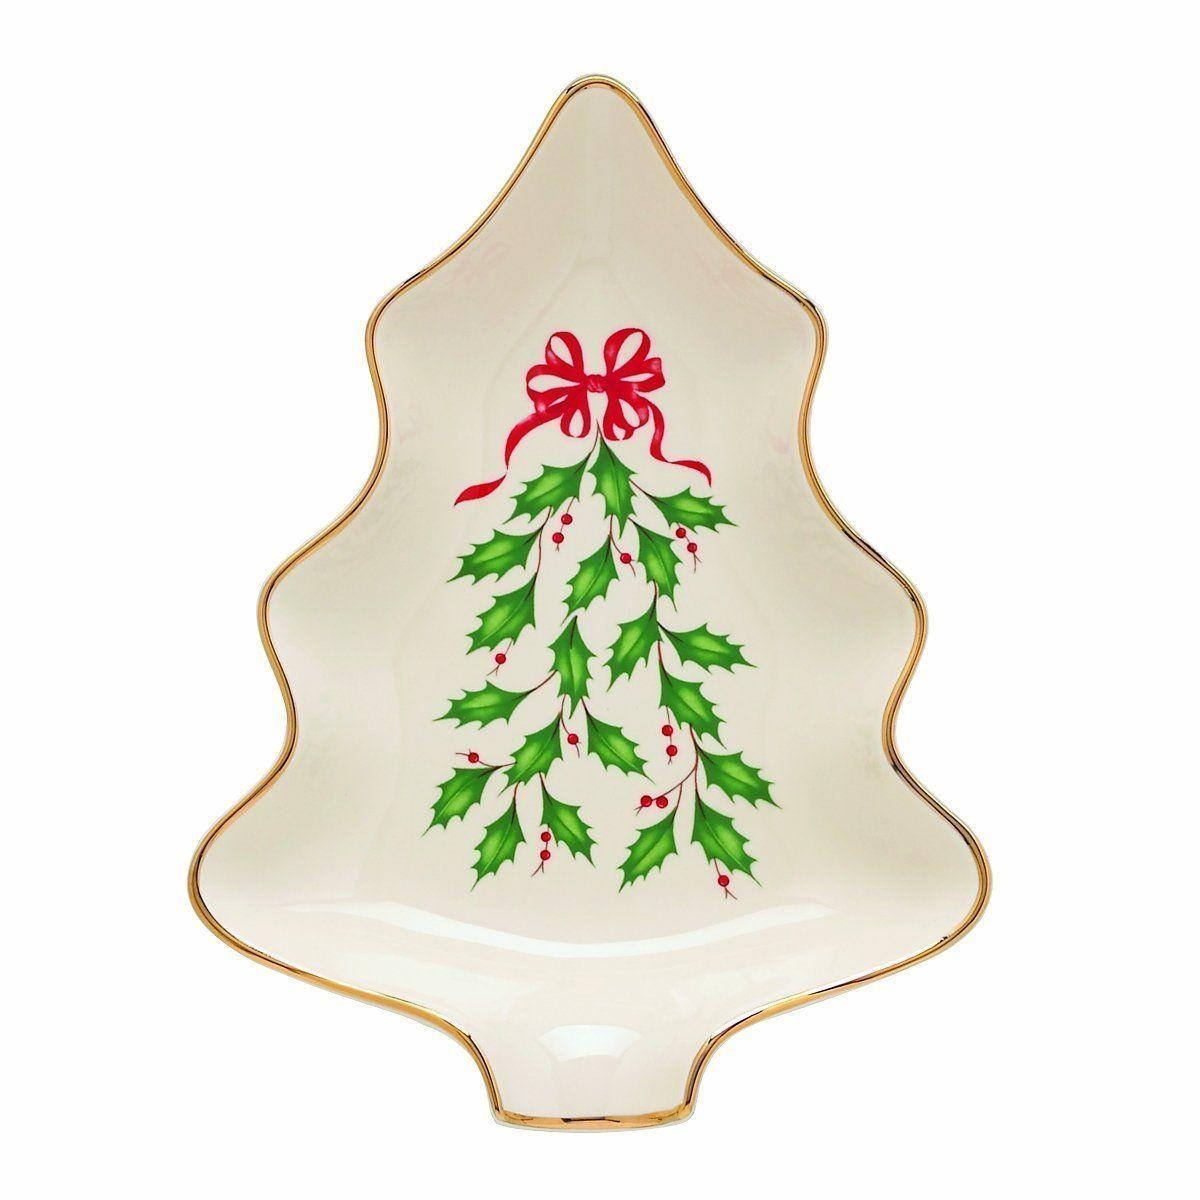 "LENOX Holiday CHRISTMAS 7.5"" TREE CANDY DISH, NEW in Box"